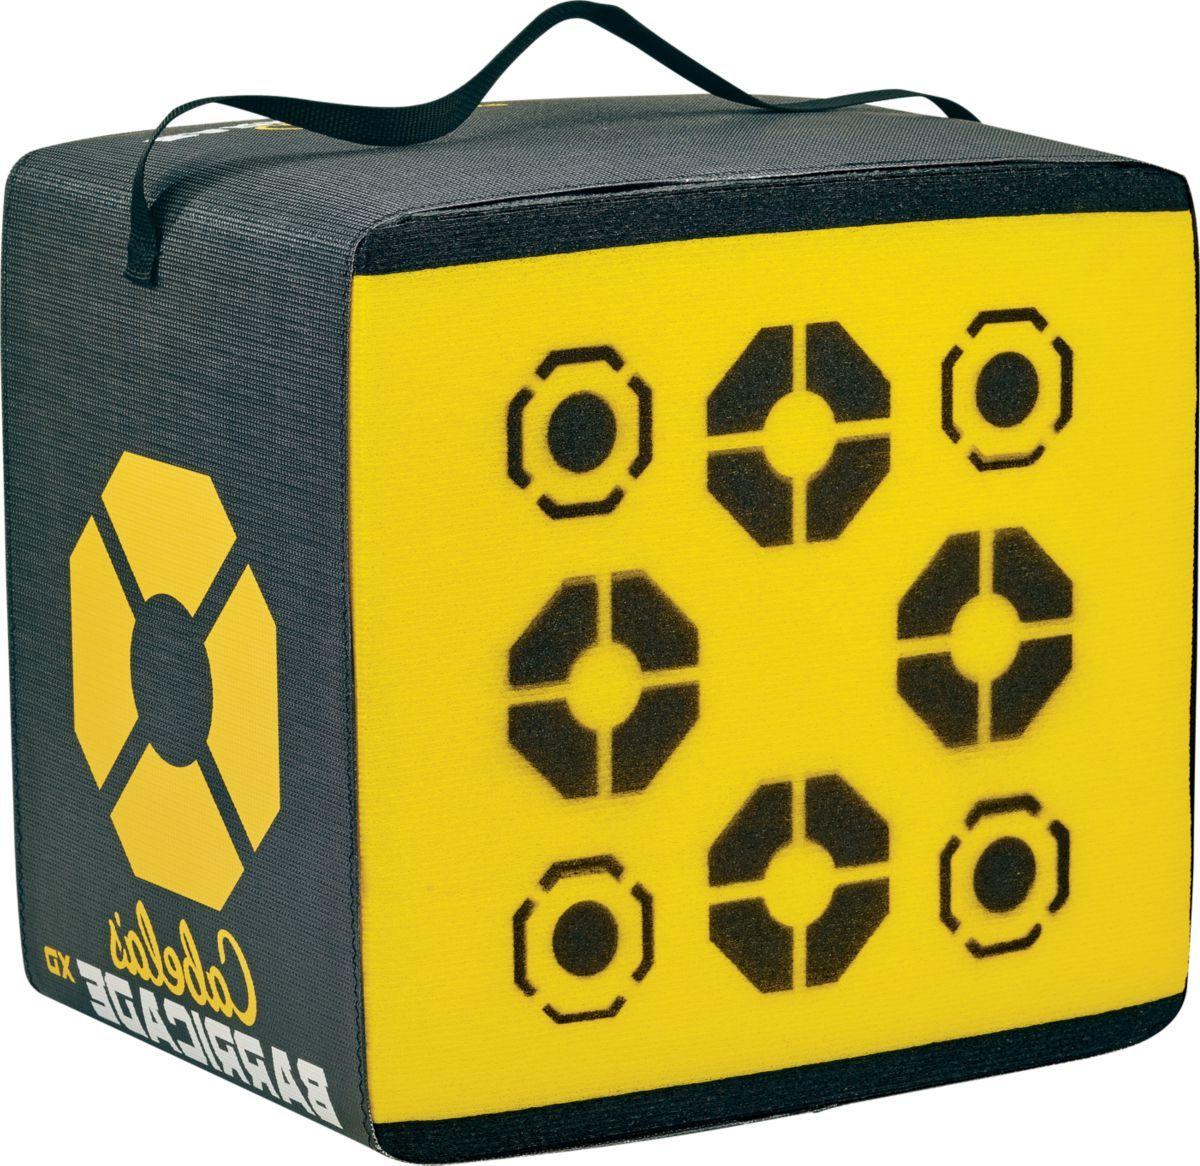 Cabela's Barricade XD Target